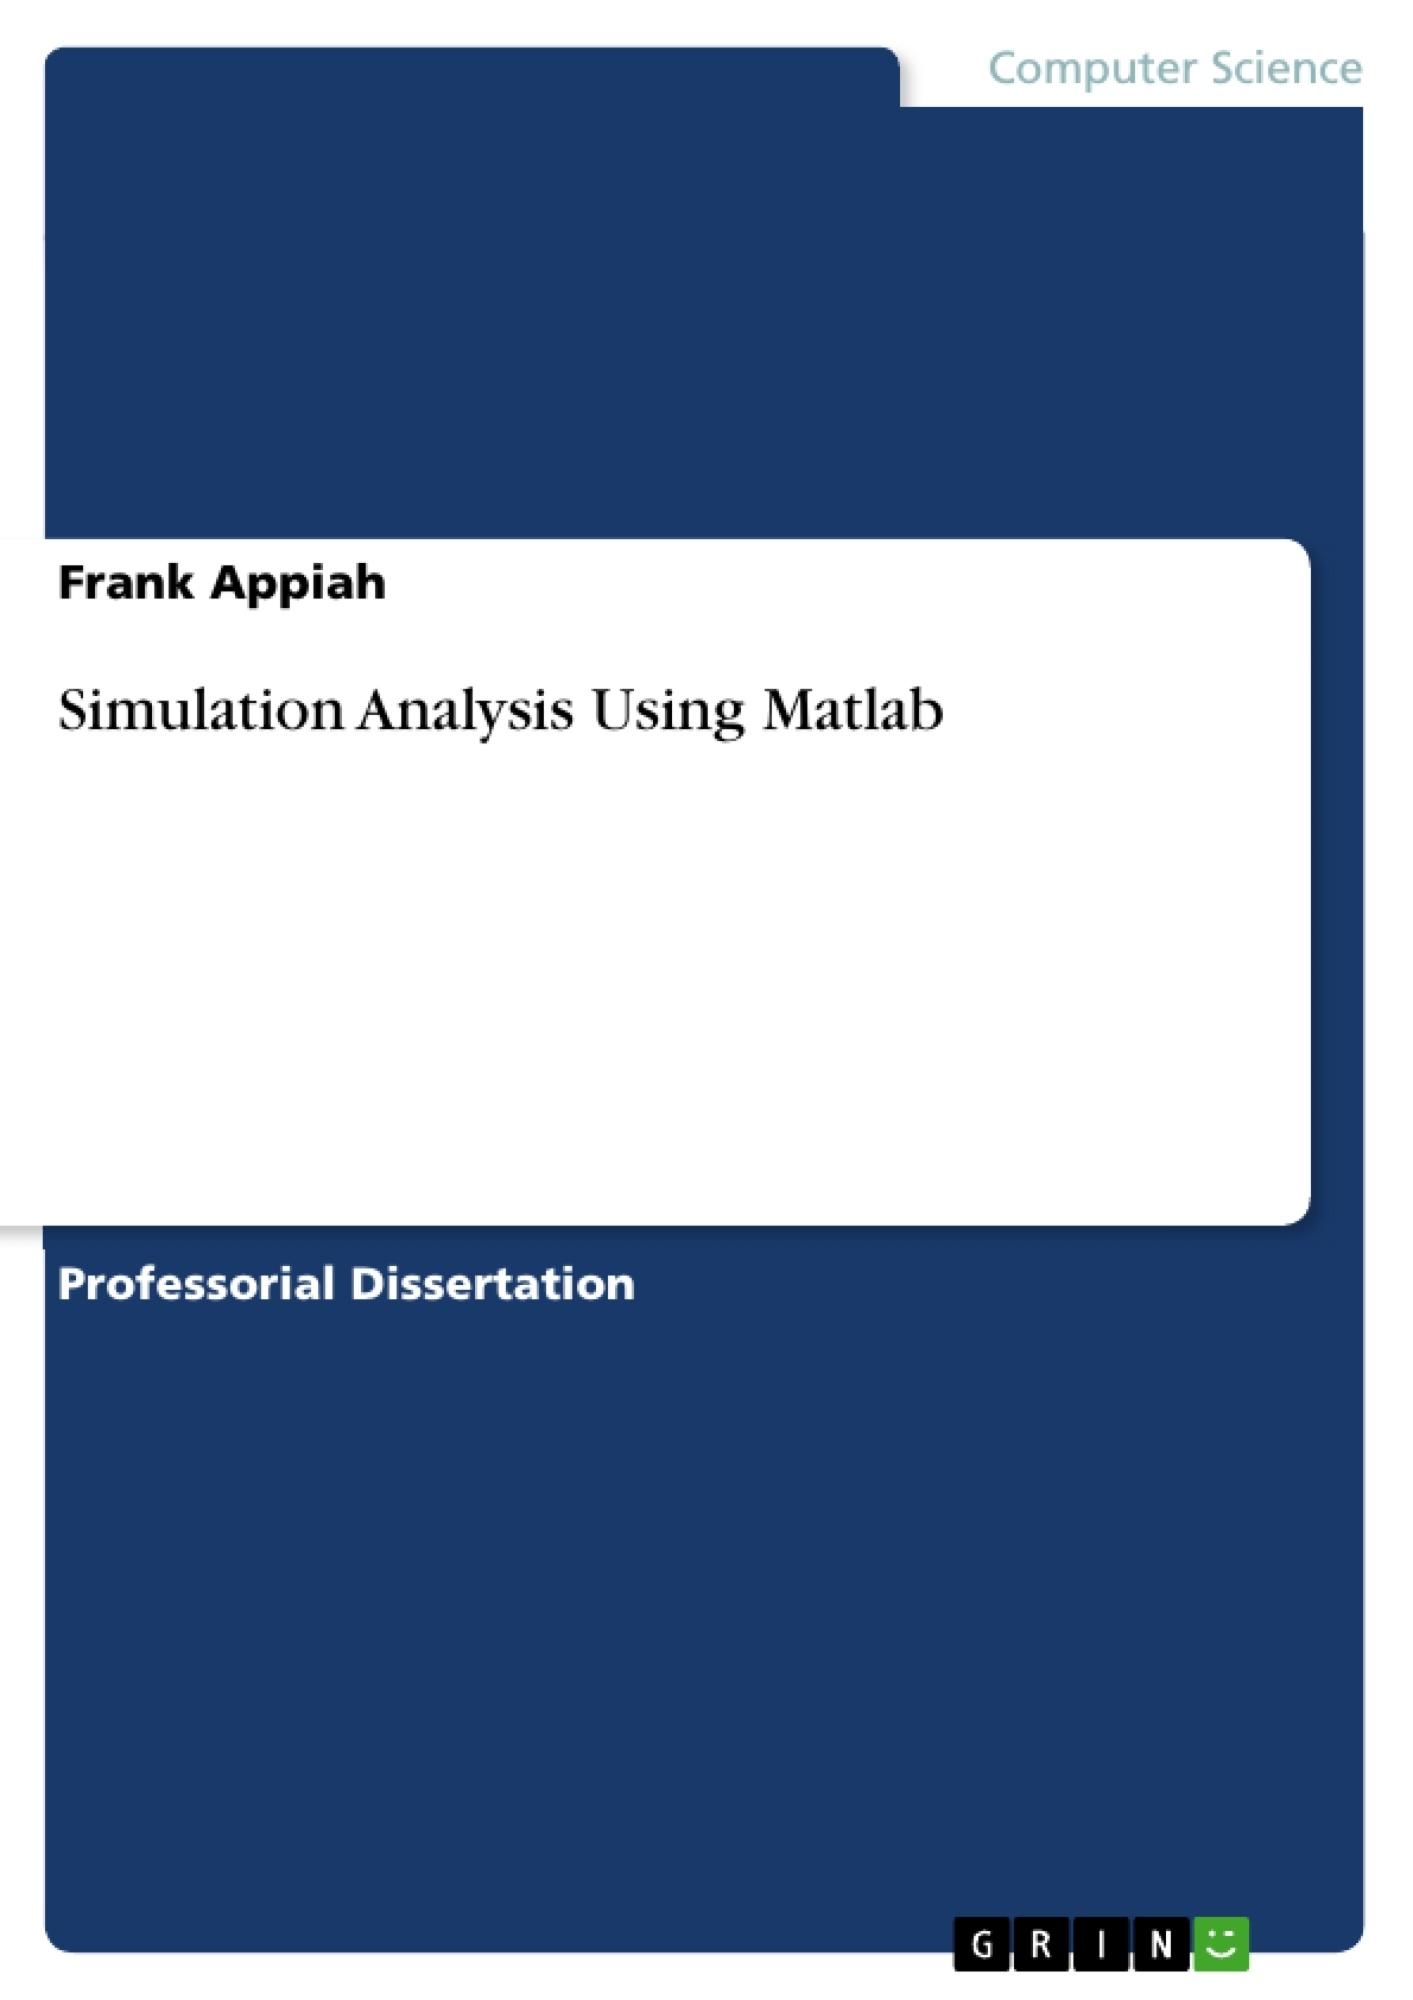 Title: Simulation Analysis Using Matlab